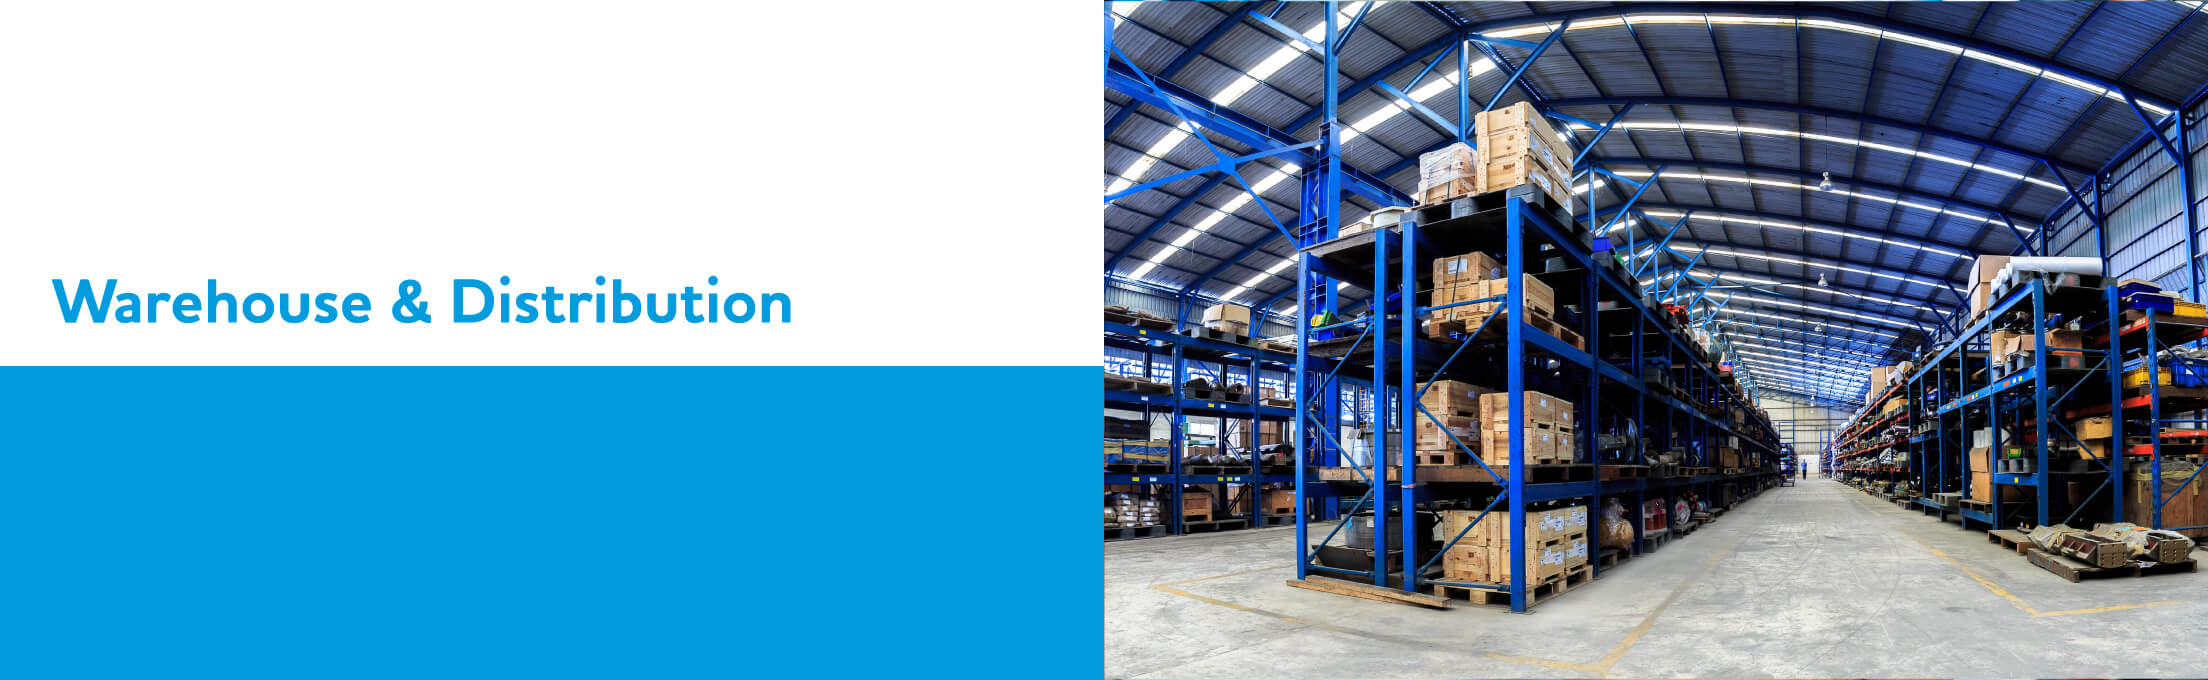 Warehouse-n-Distribution